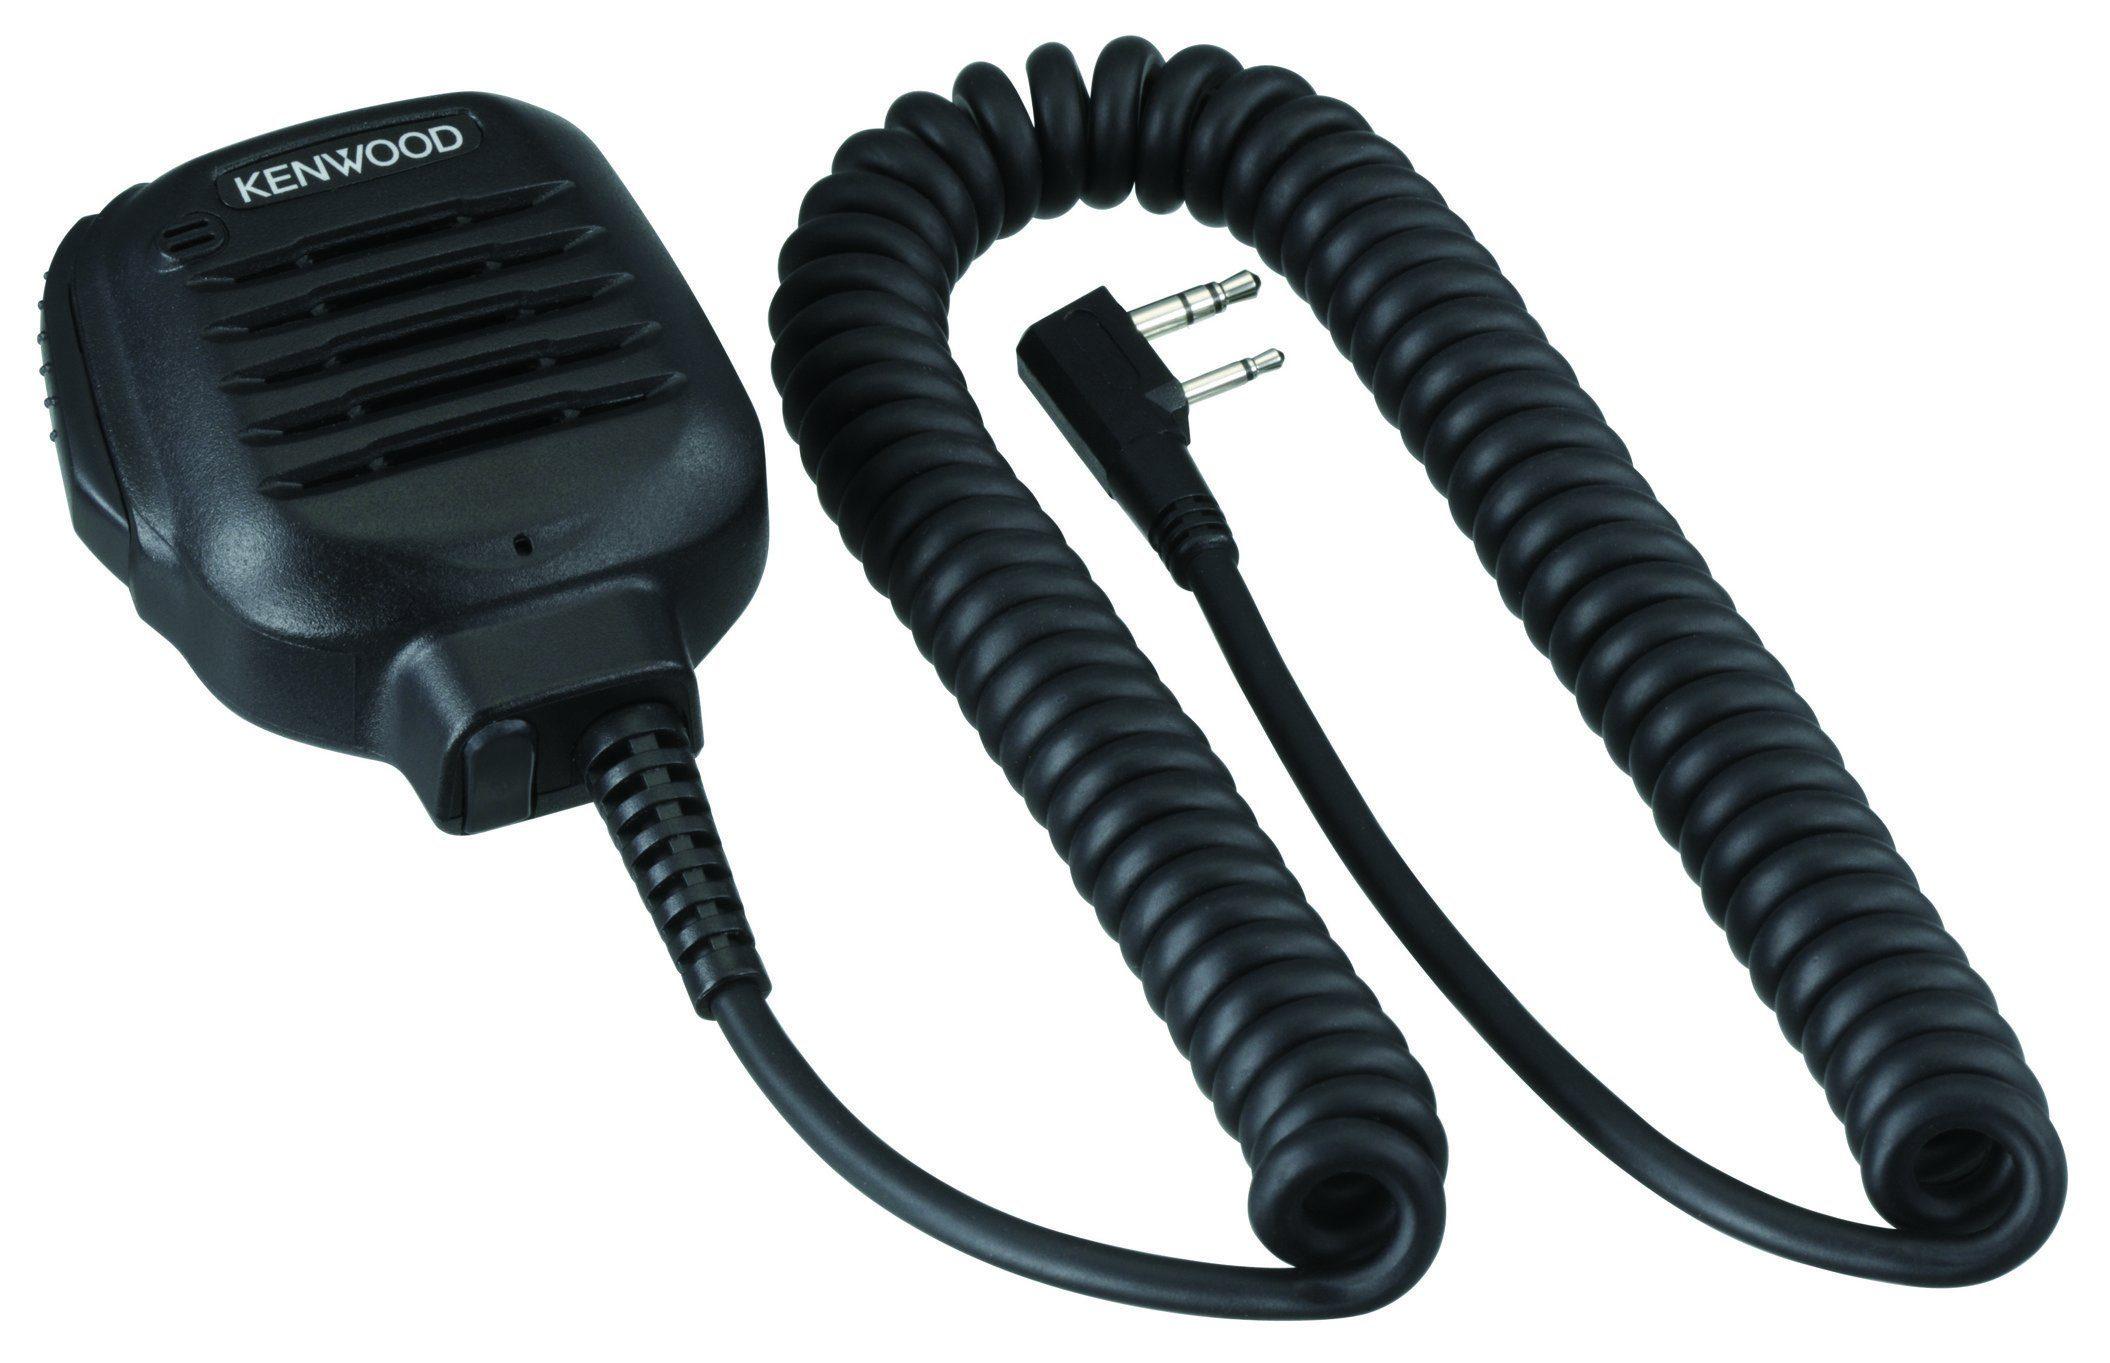 Kenwood Lautsprechermikrofon »KMC-45DW«